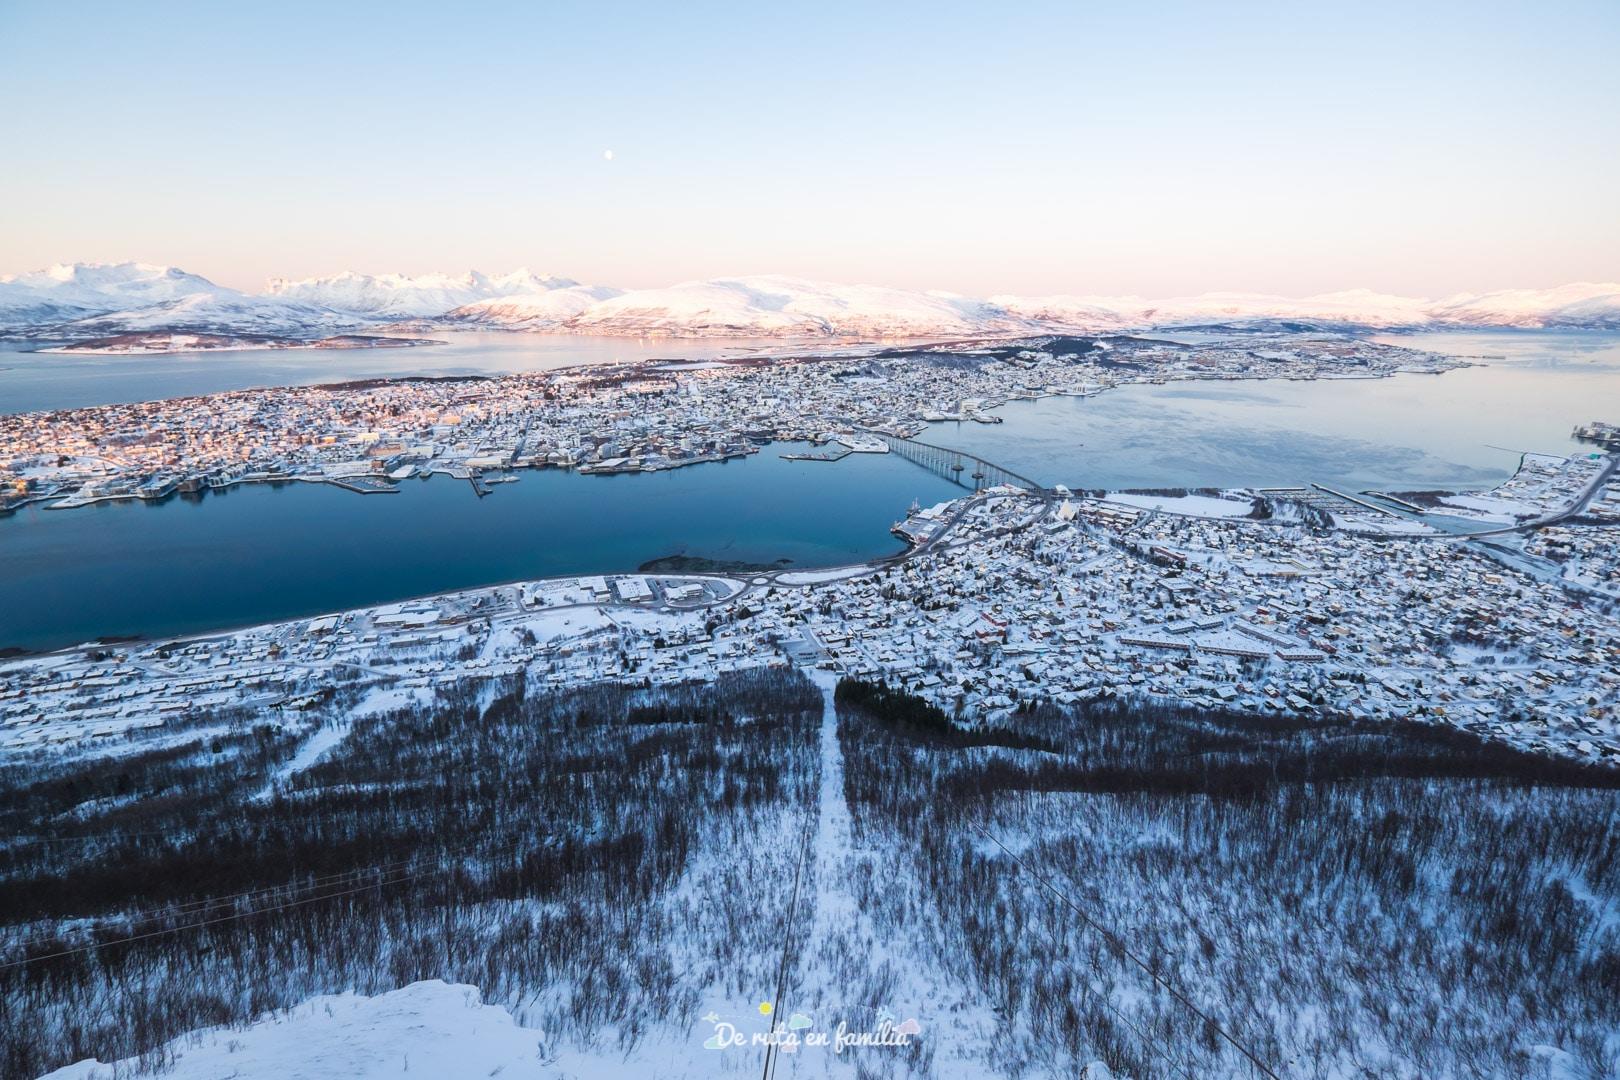 Viatjar a Tromso. Visitar Tromso